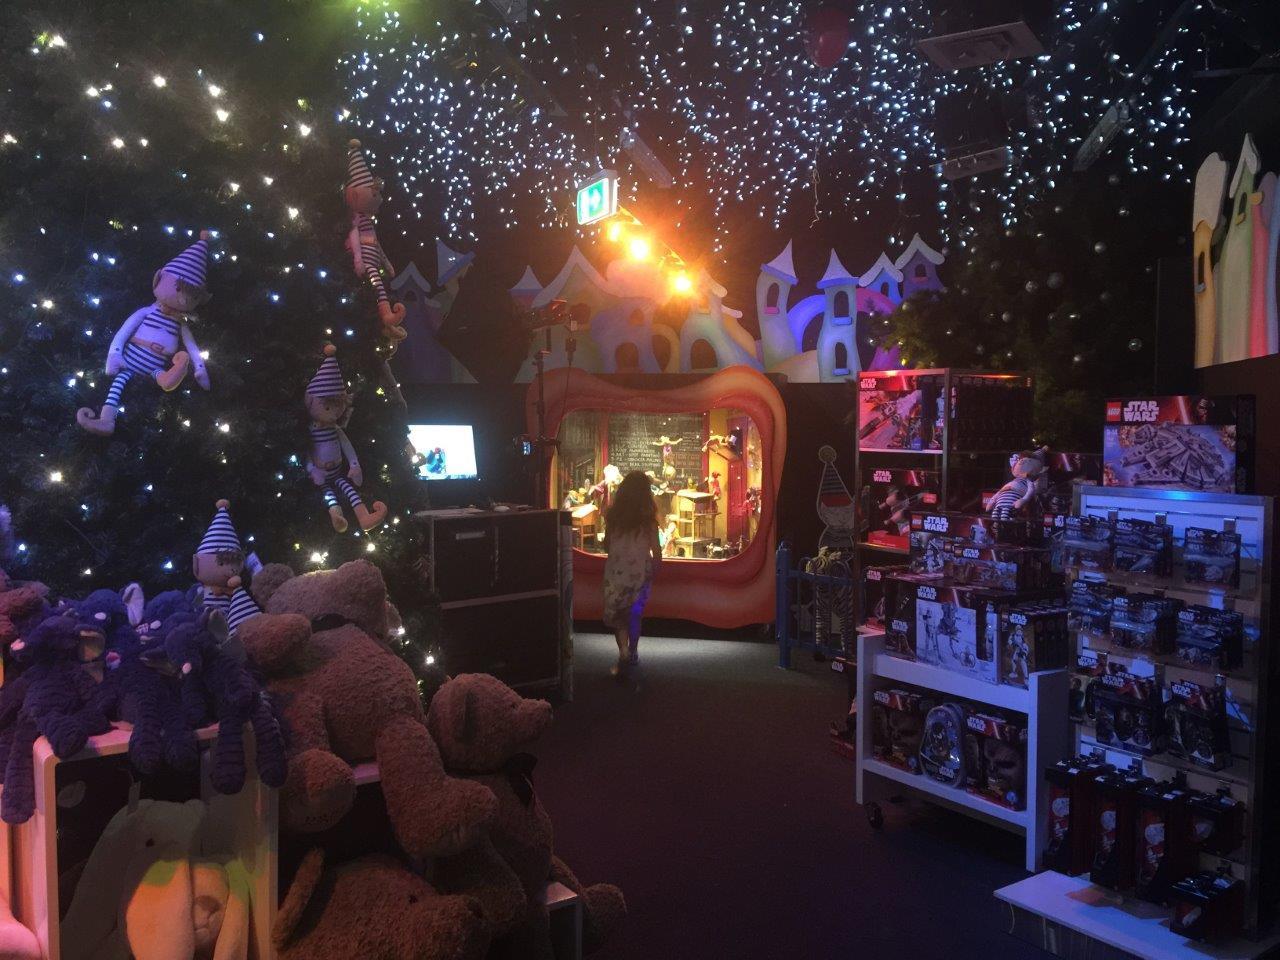 The David Jones Christmas Magic Cave